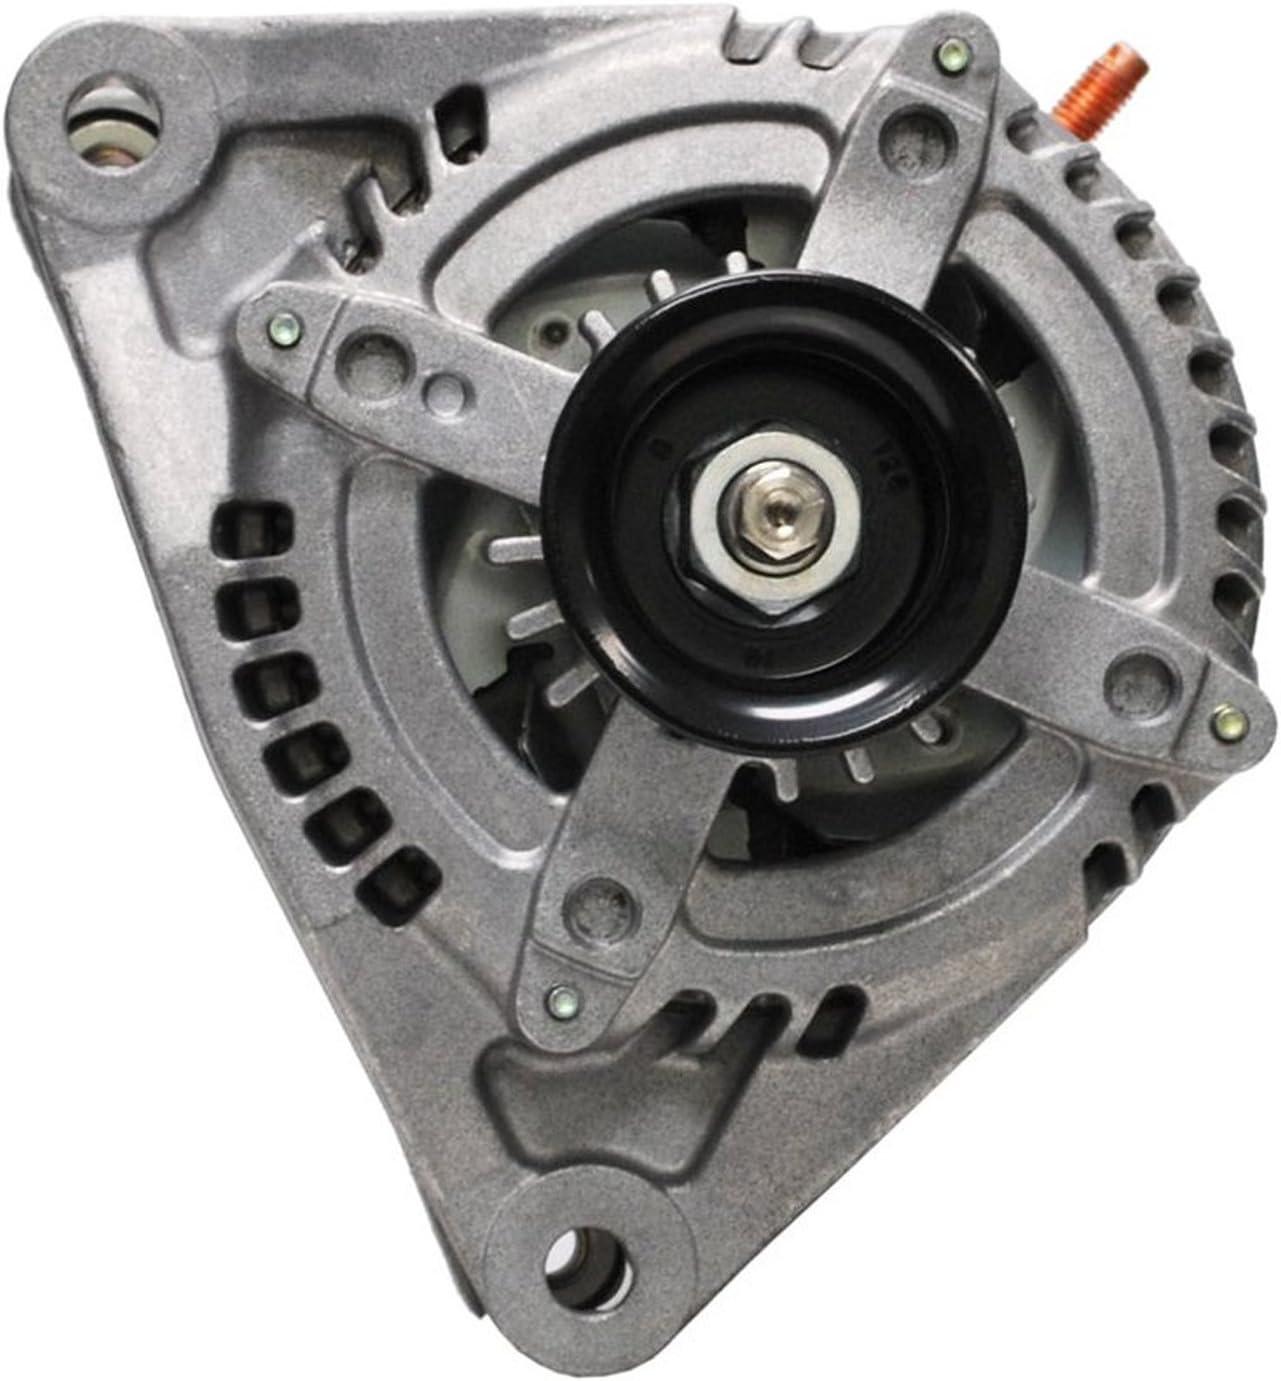 Remanufactured ACDelco 334-2898 Professional Alternator